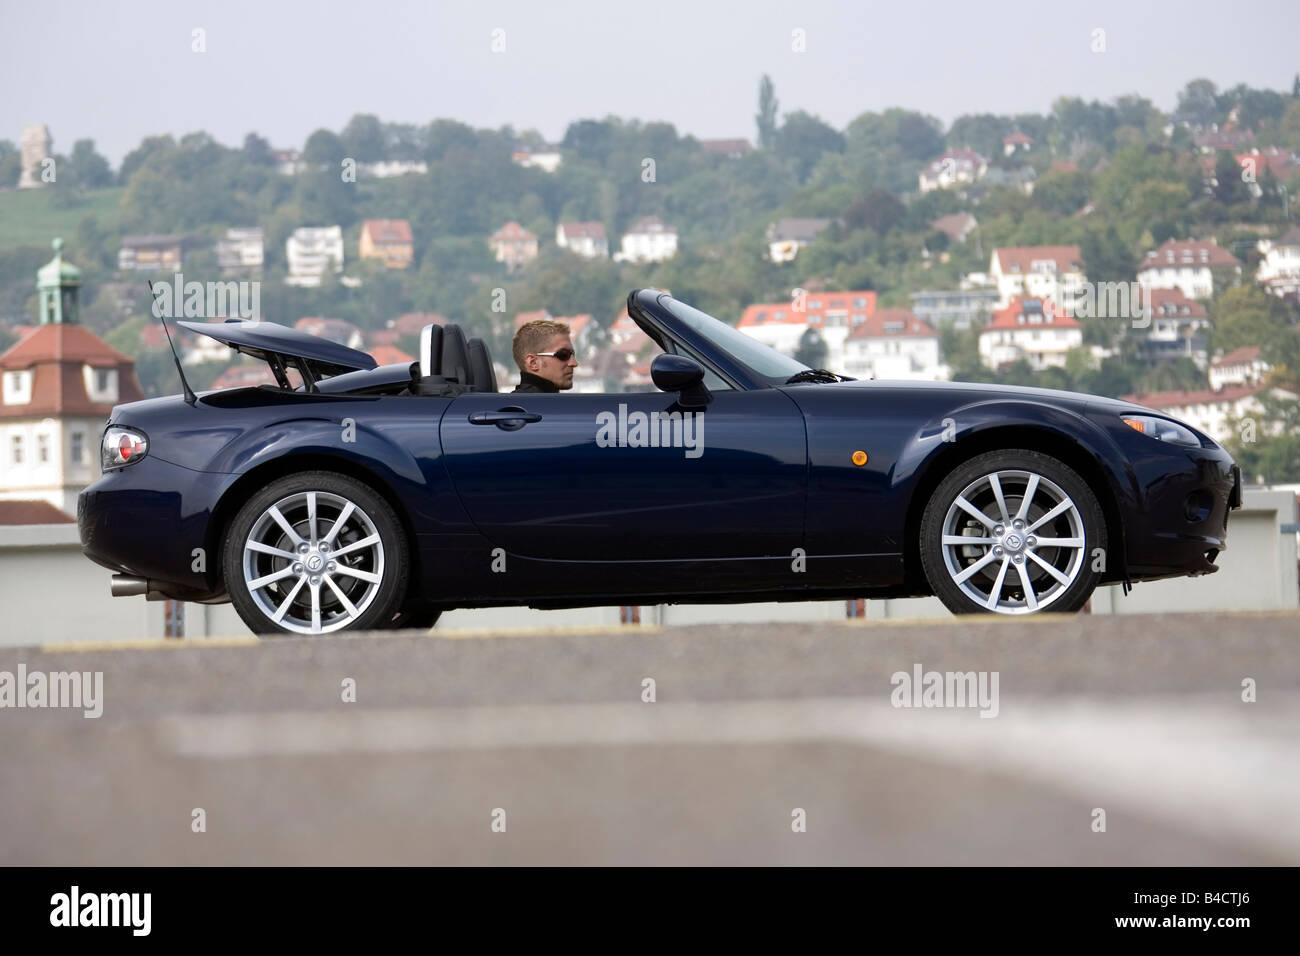 https://c8.alamy.com/comp/B4CTJ6/mazda-mx-5-20-mzr-roadster-coupe-model-year-2006-blue-standing-upholding-B4CTJ6.jpg